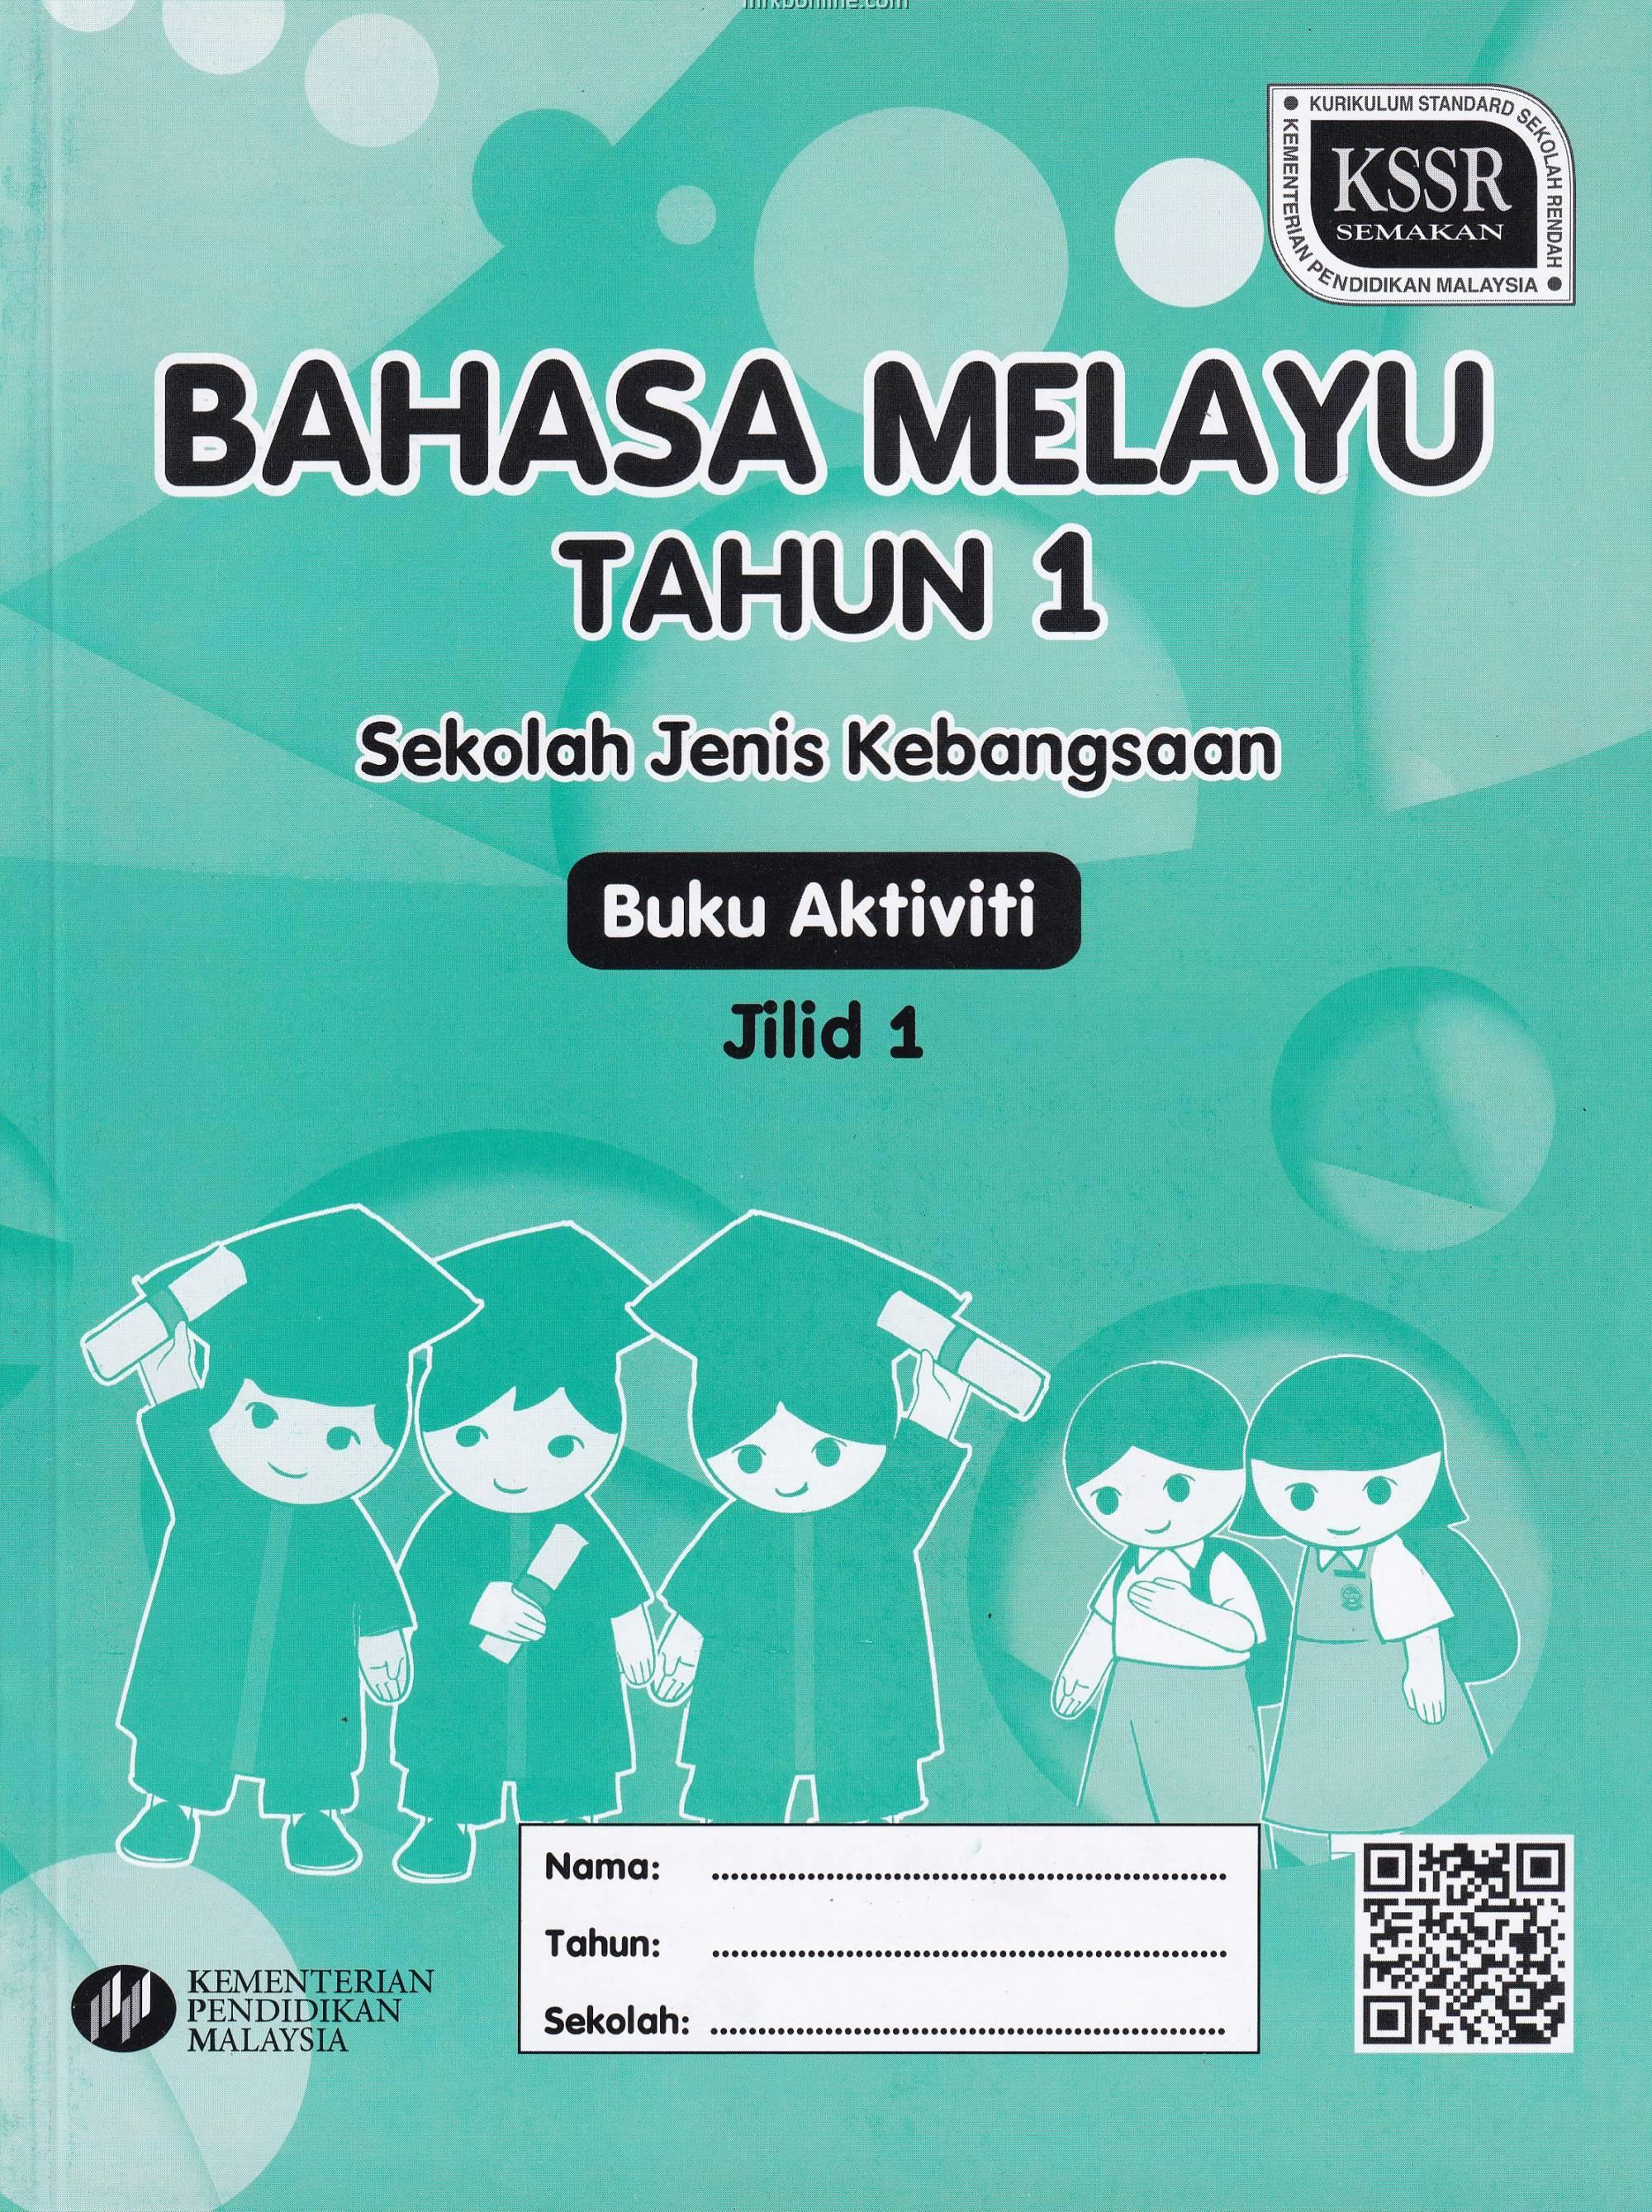 Buku Aktiviti Bahasa Melayu Jilid 1 Sjk Tahun 1